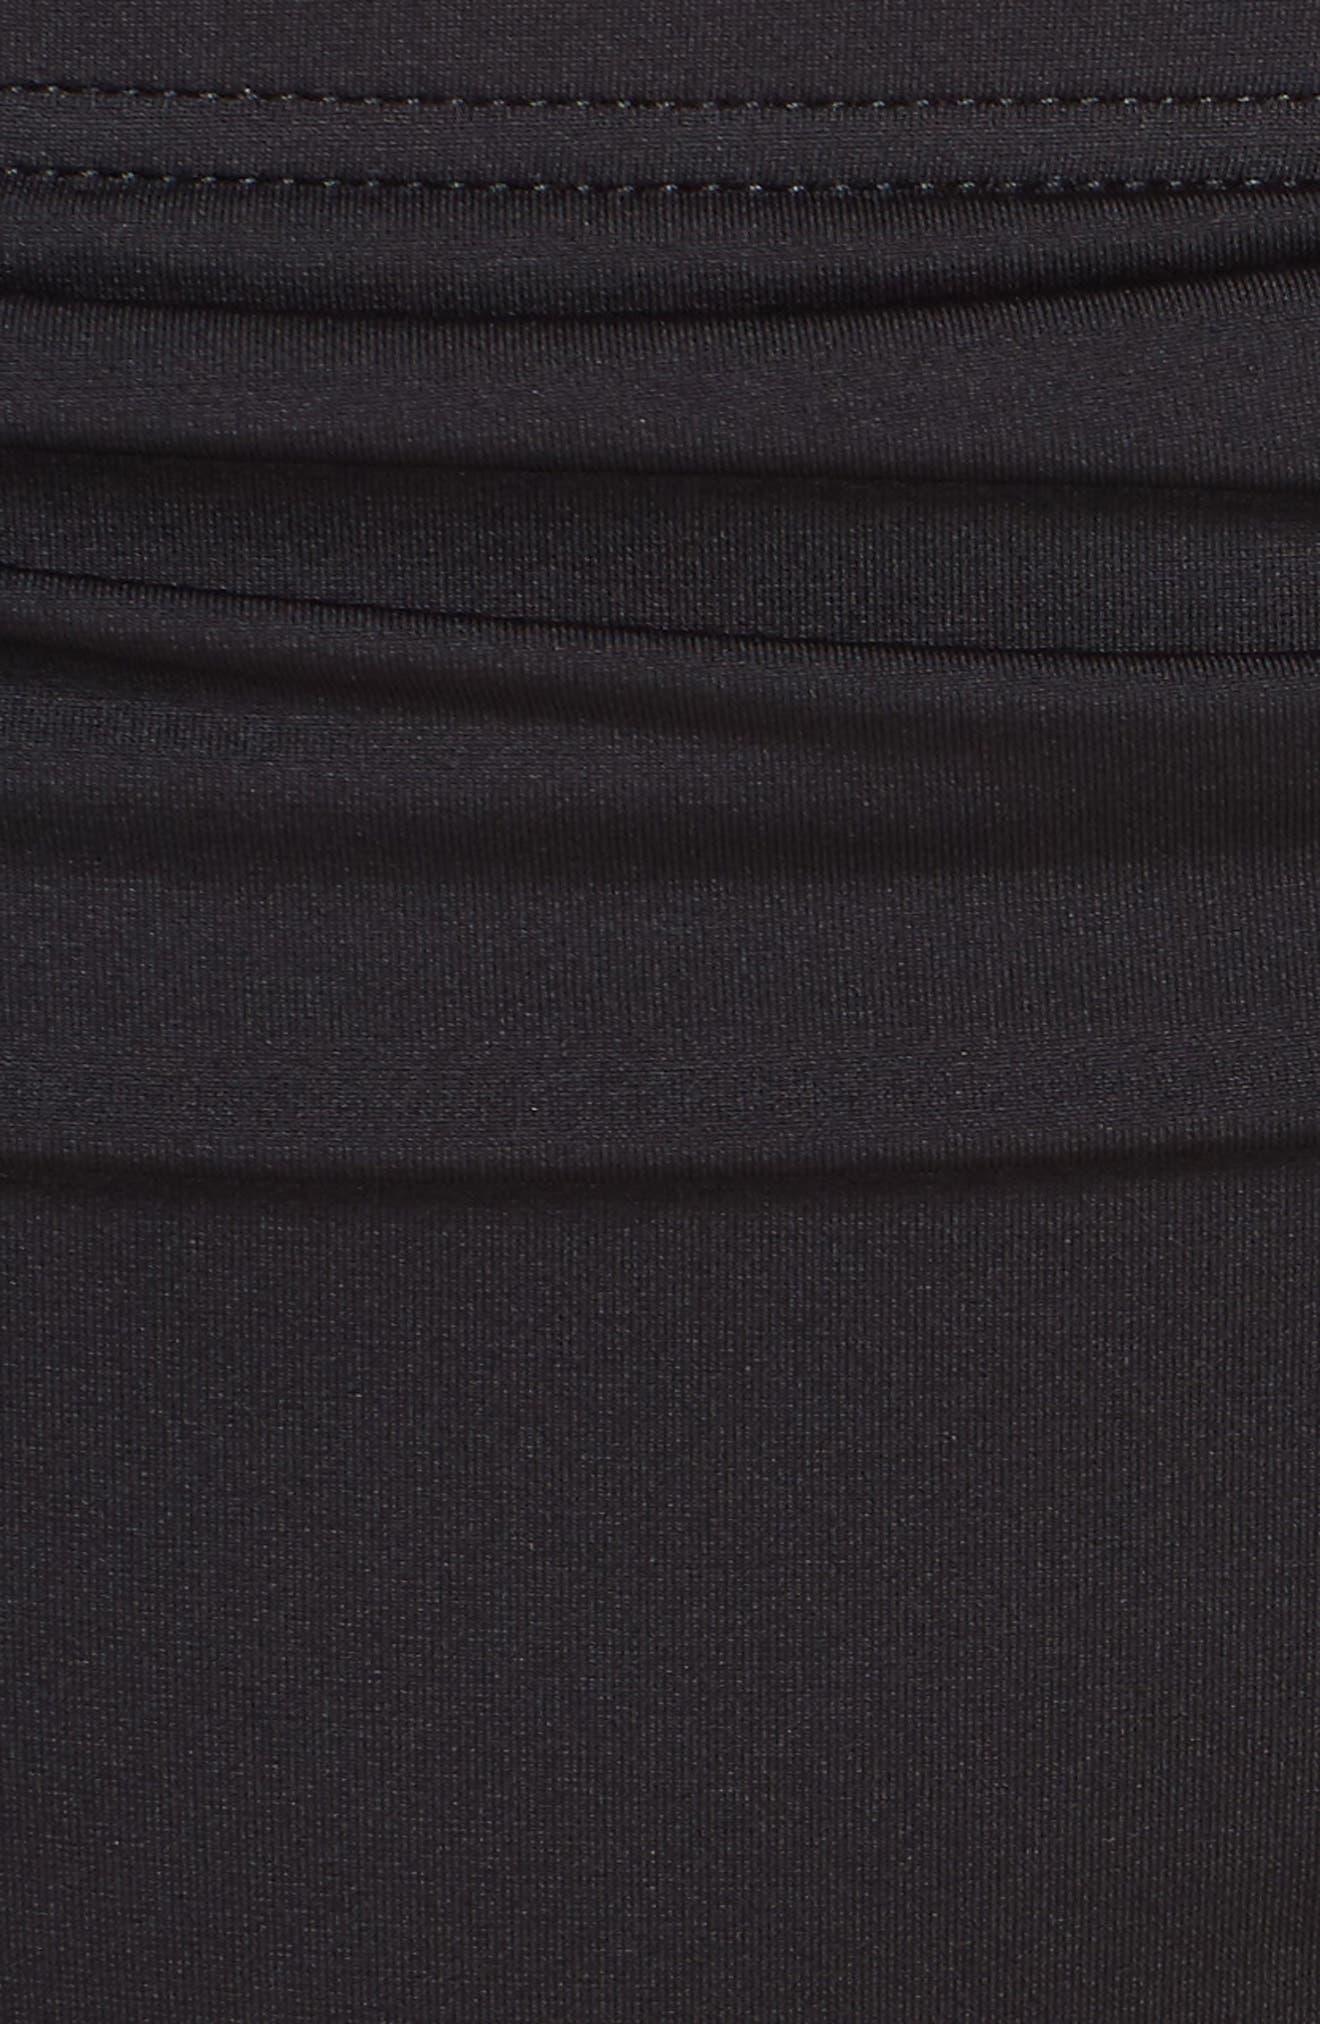 TOMMY BAHAMA,                             'Pearl' High Waist Bikini Bottoms,                             Alternate thumbnail 6, color,                             BLACK